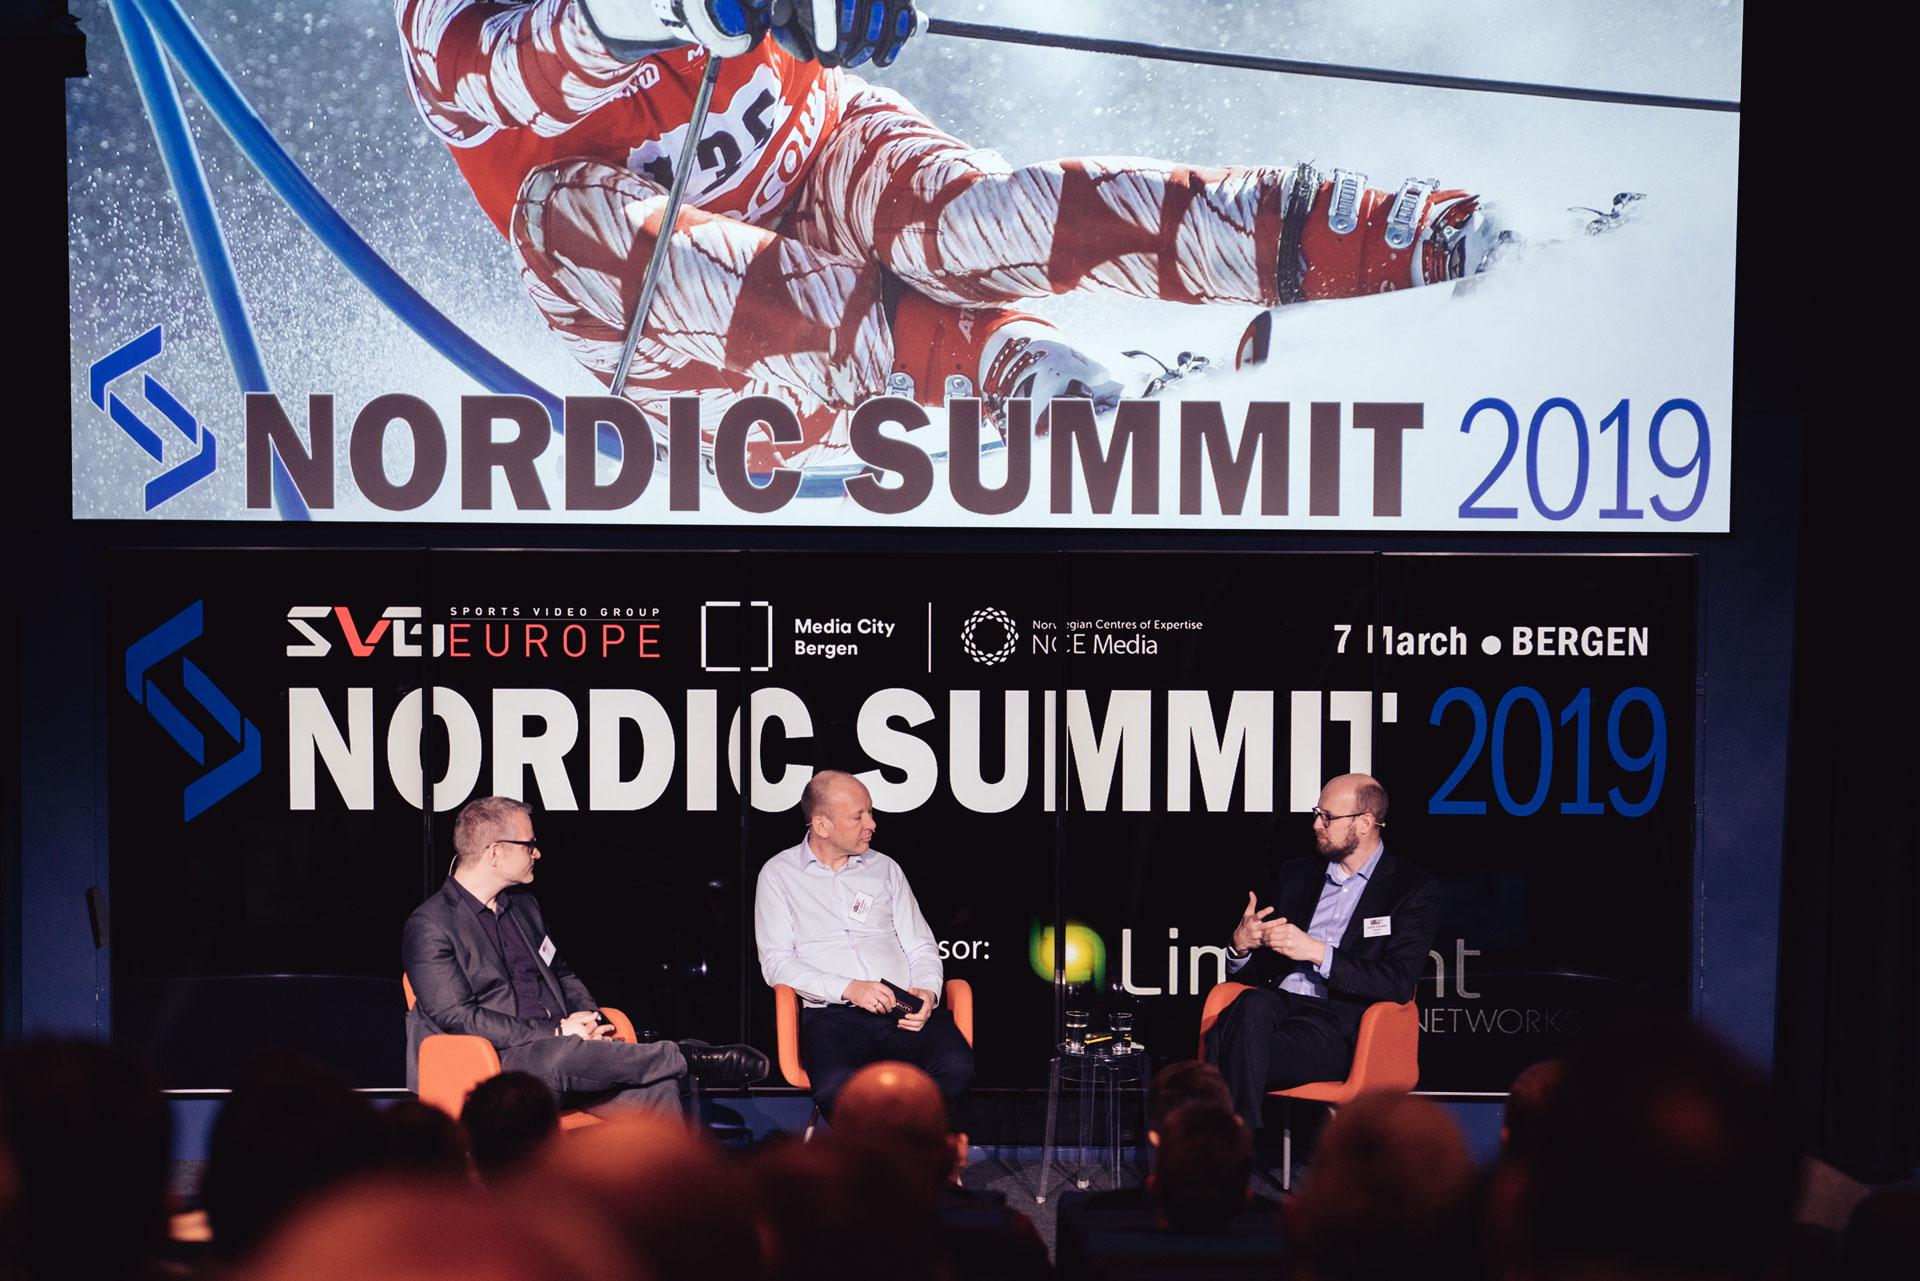 SVG Nordic Summit 2019